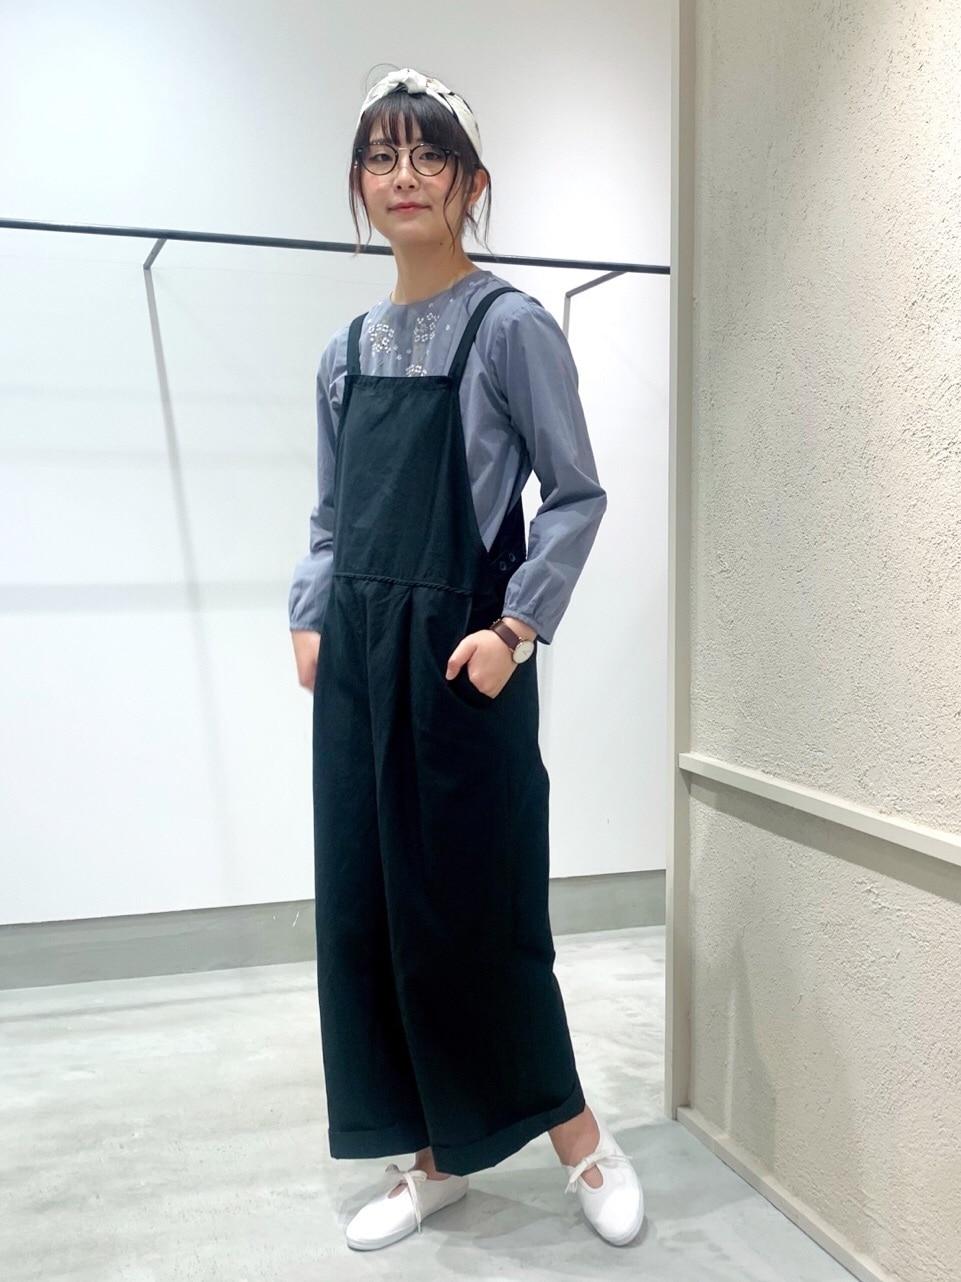 chambre de charme 横浜ジョイナス 身長:162cm 2021.02.05